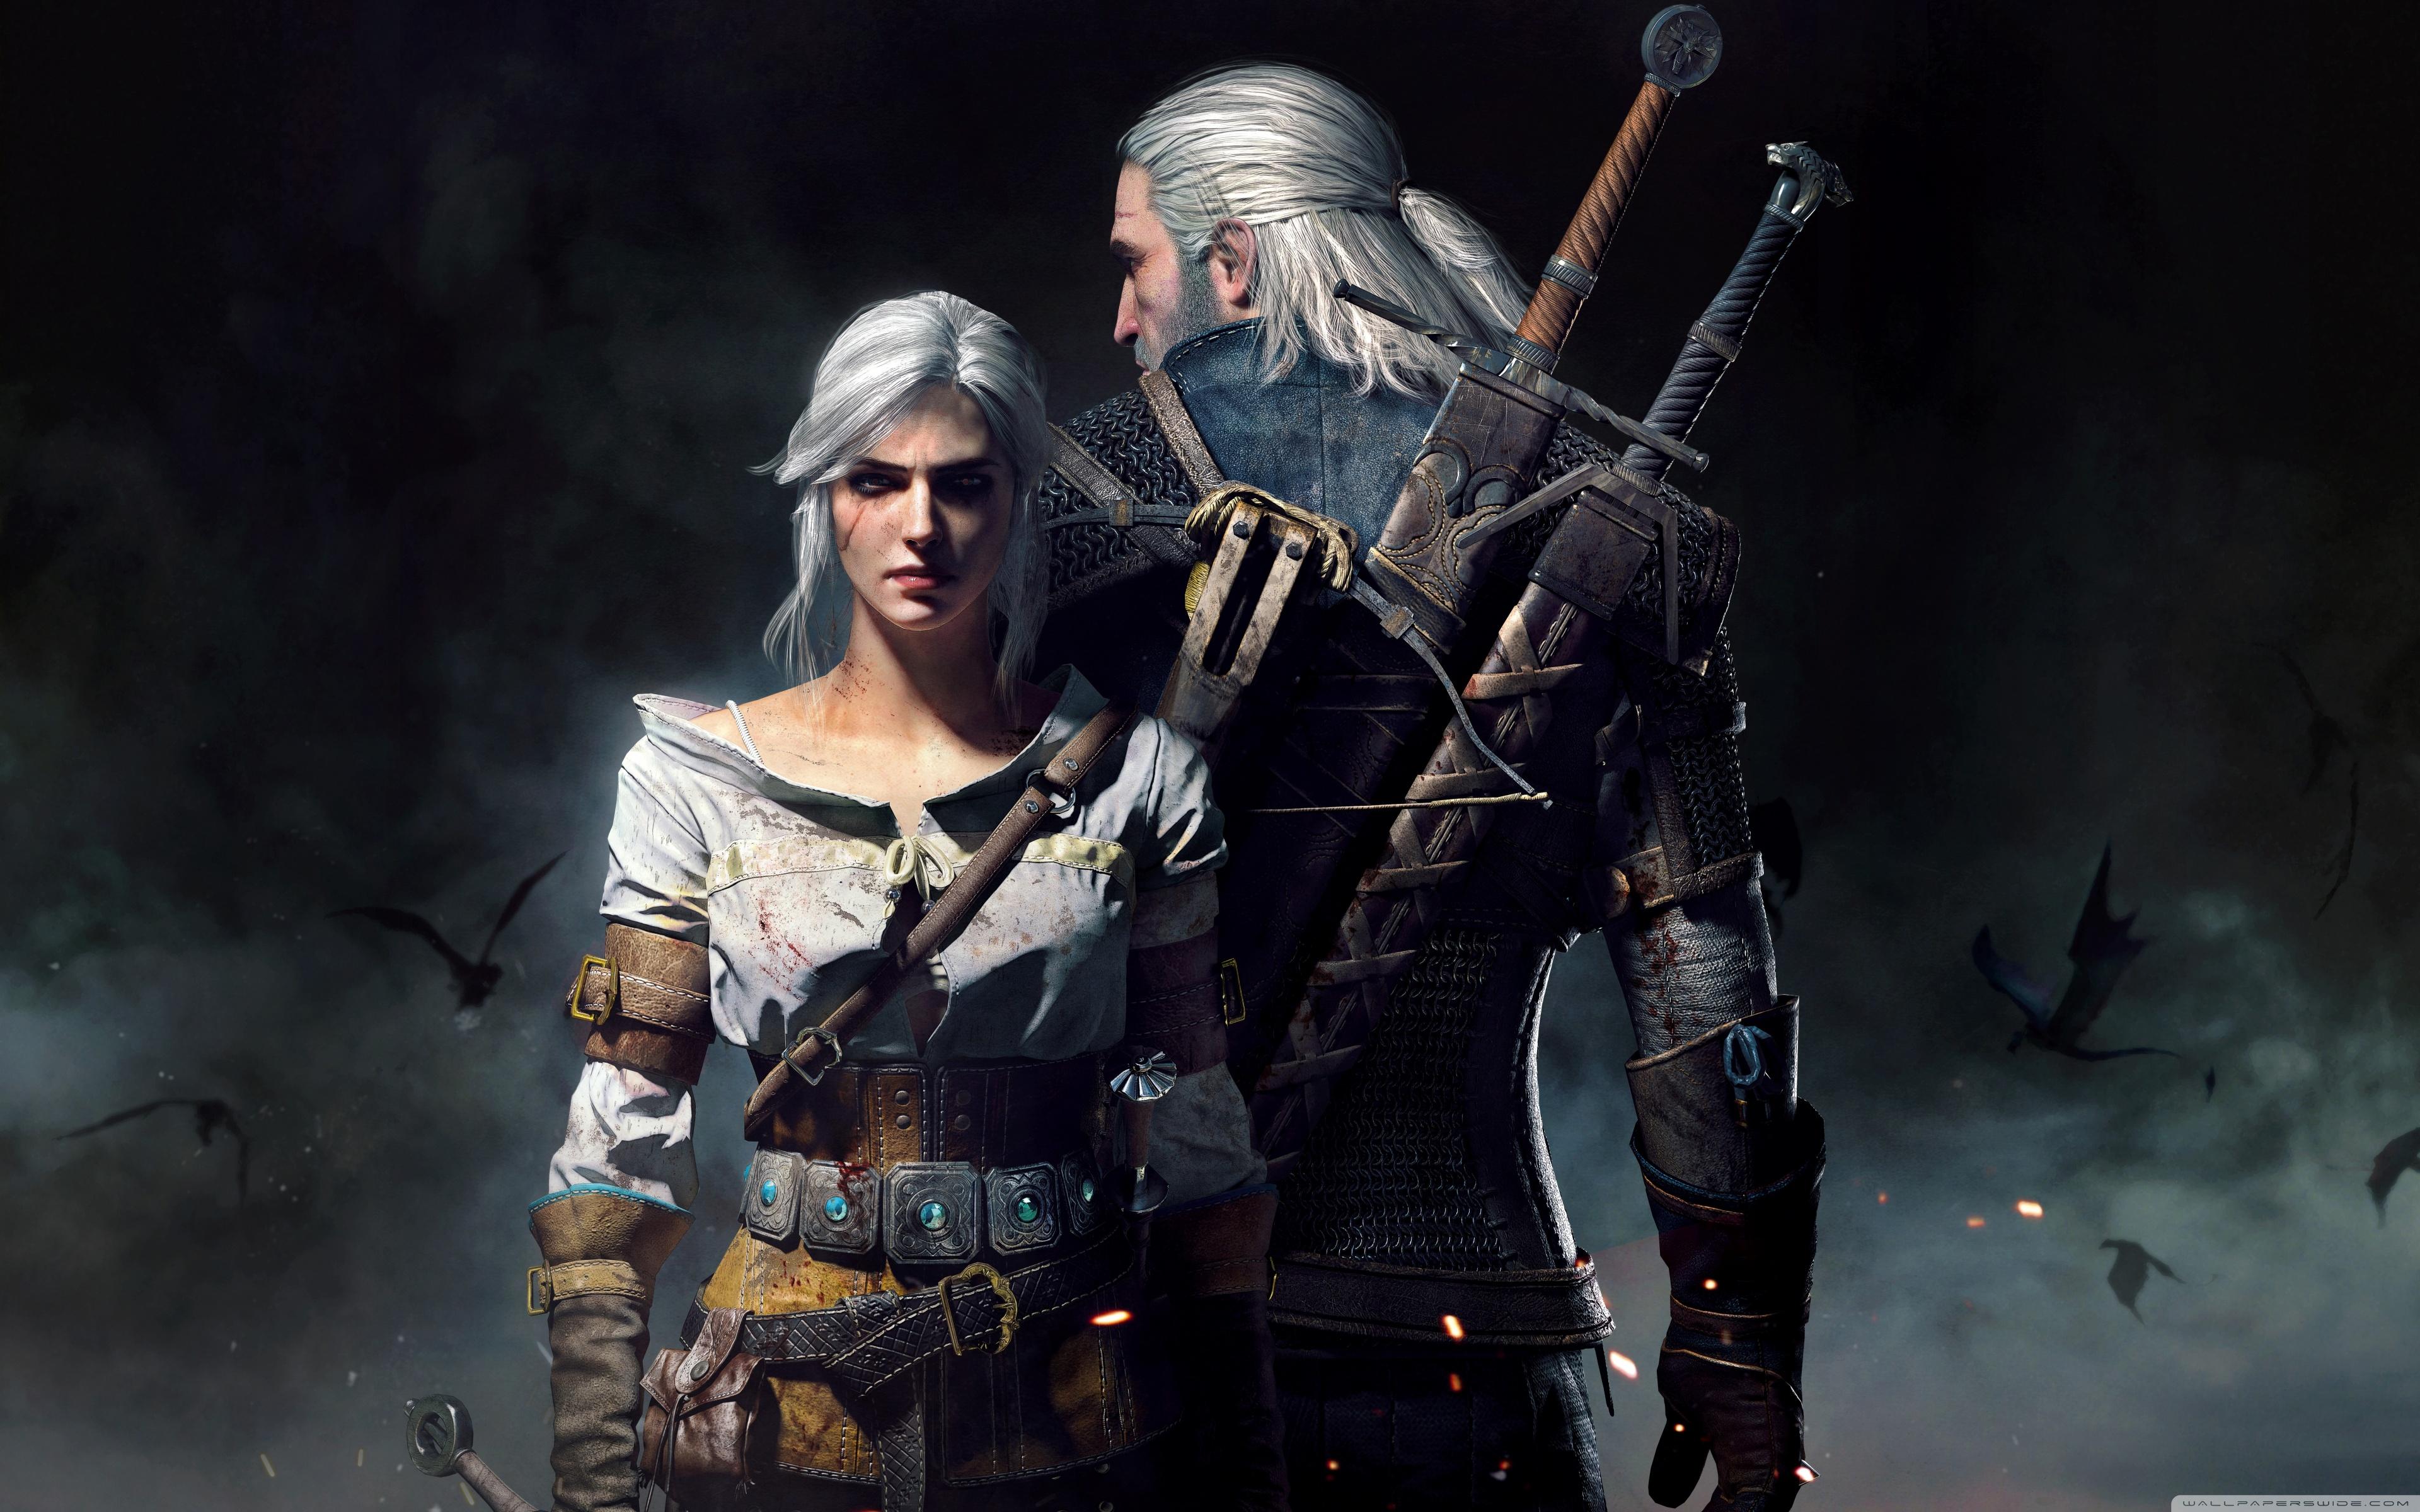 The Witcher 3 Wild Hunt Geralt and Ciri 4K HD Desktop Wallpaper 3840x2400